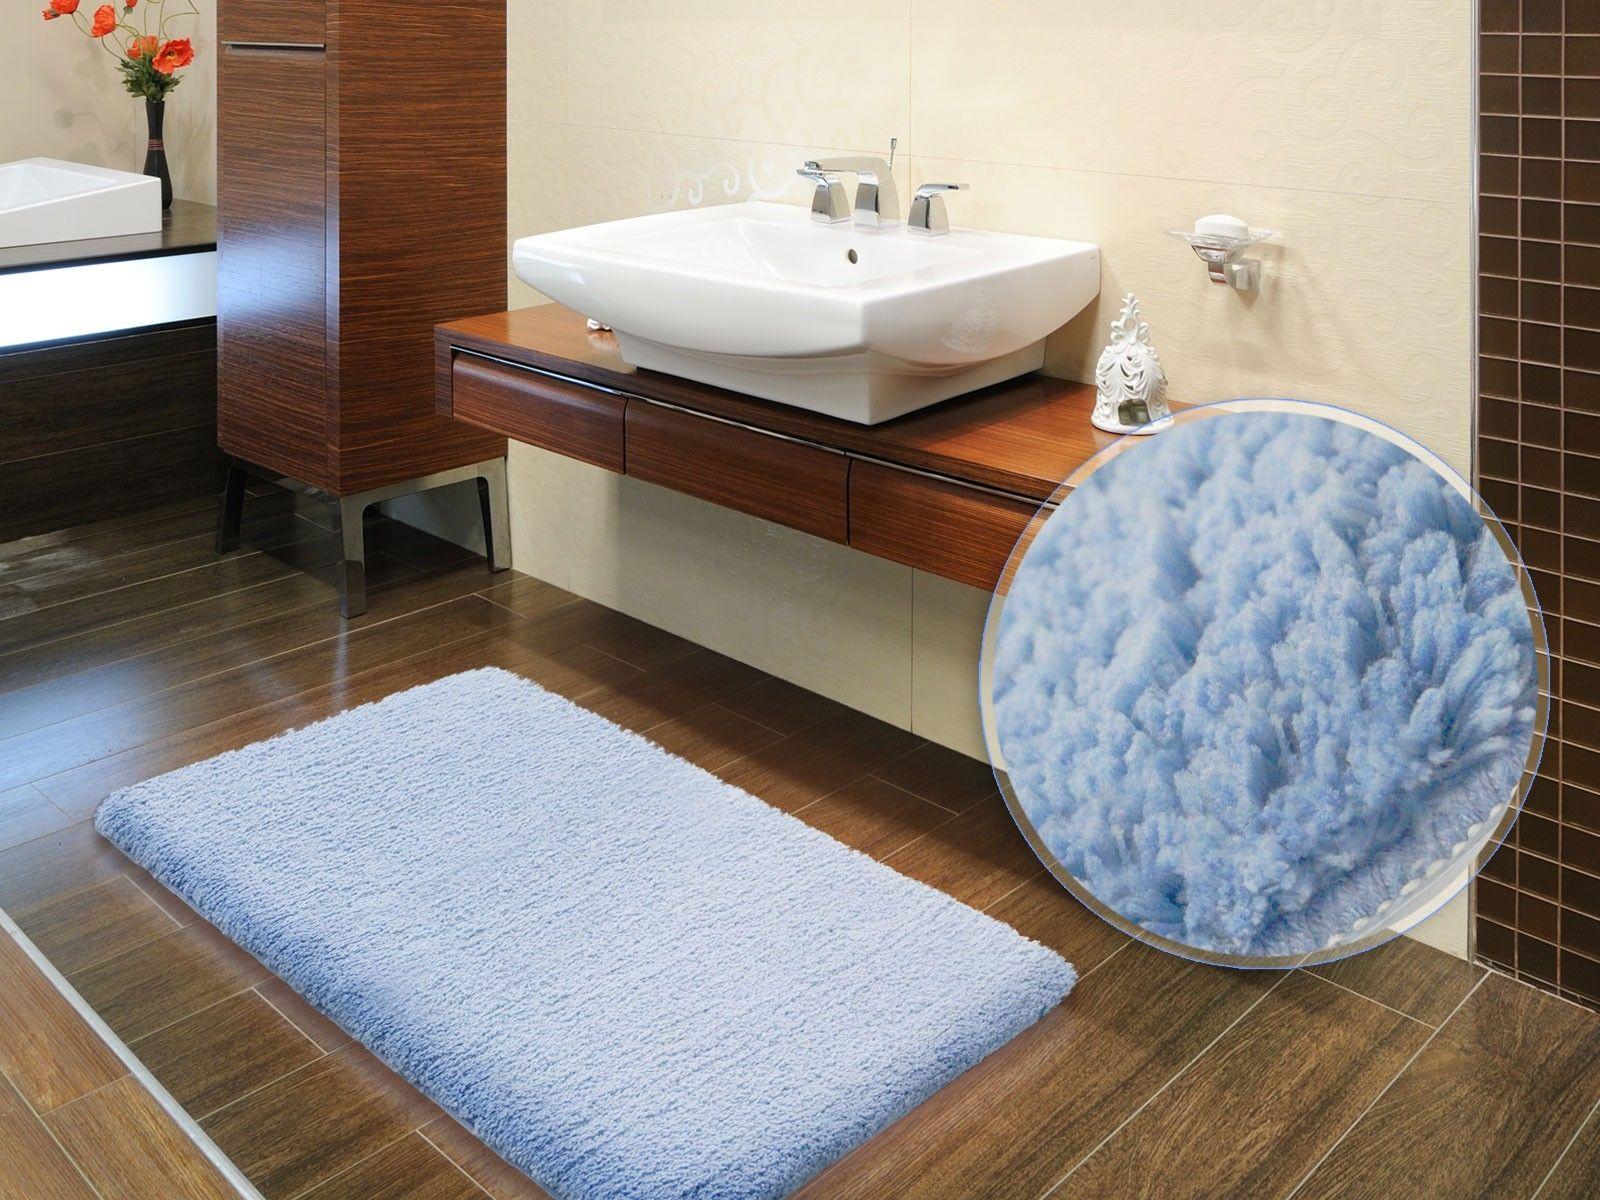 mohawk wall to wall bathroom carpet | bathroom ideas | pinterest